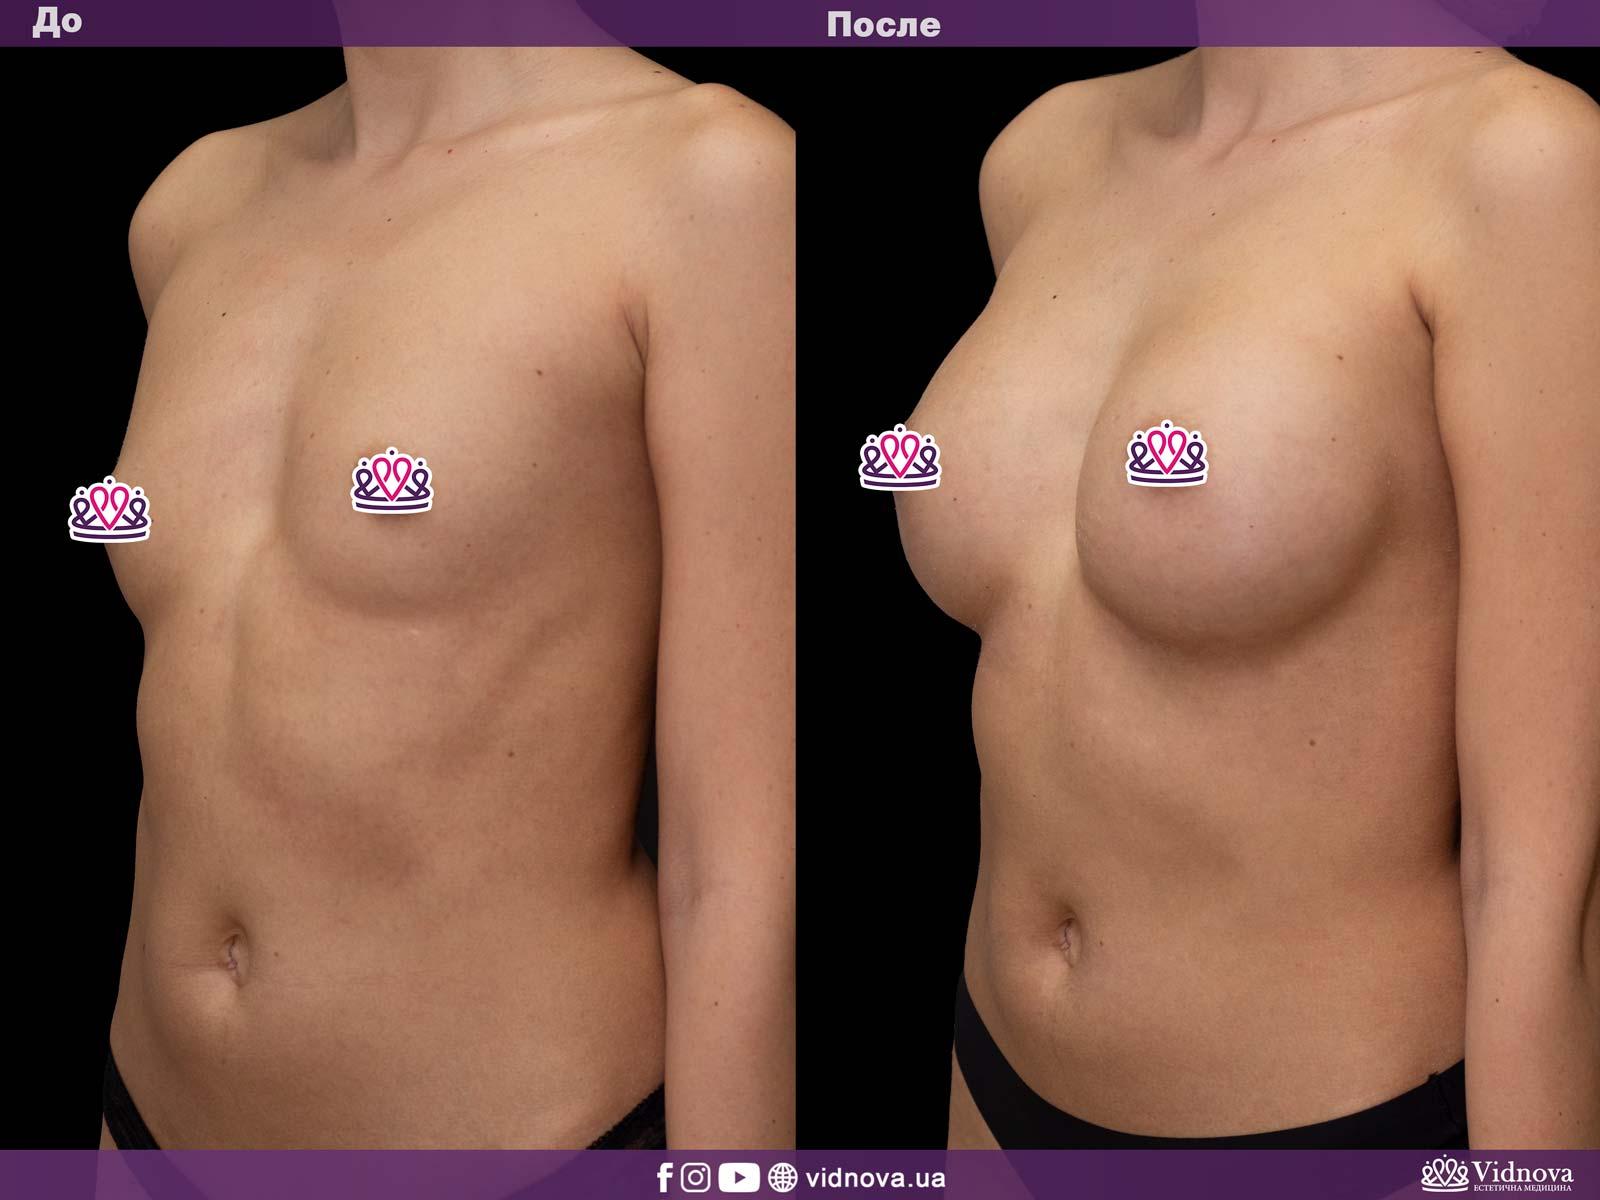 Увеличение груди: Фото ДО и ПОСЛЕ - Пример №14-2 - Клиника Vidnova